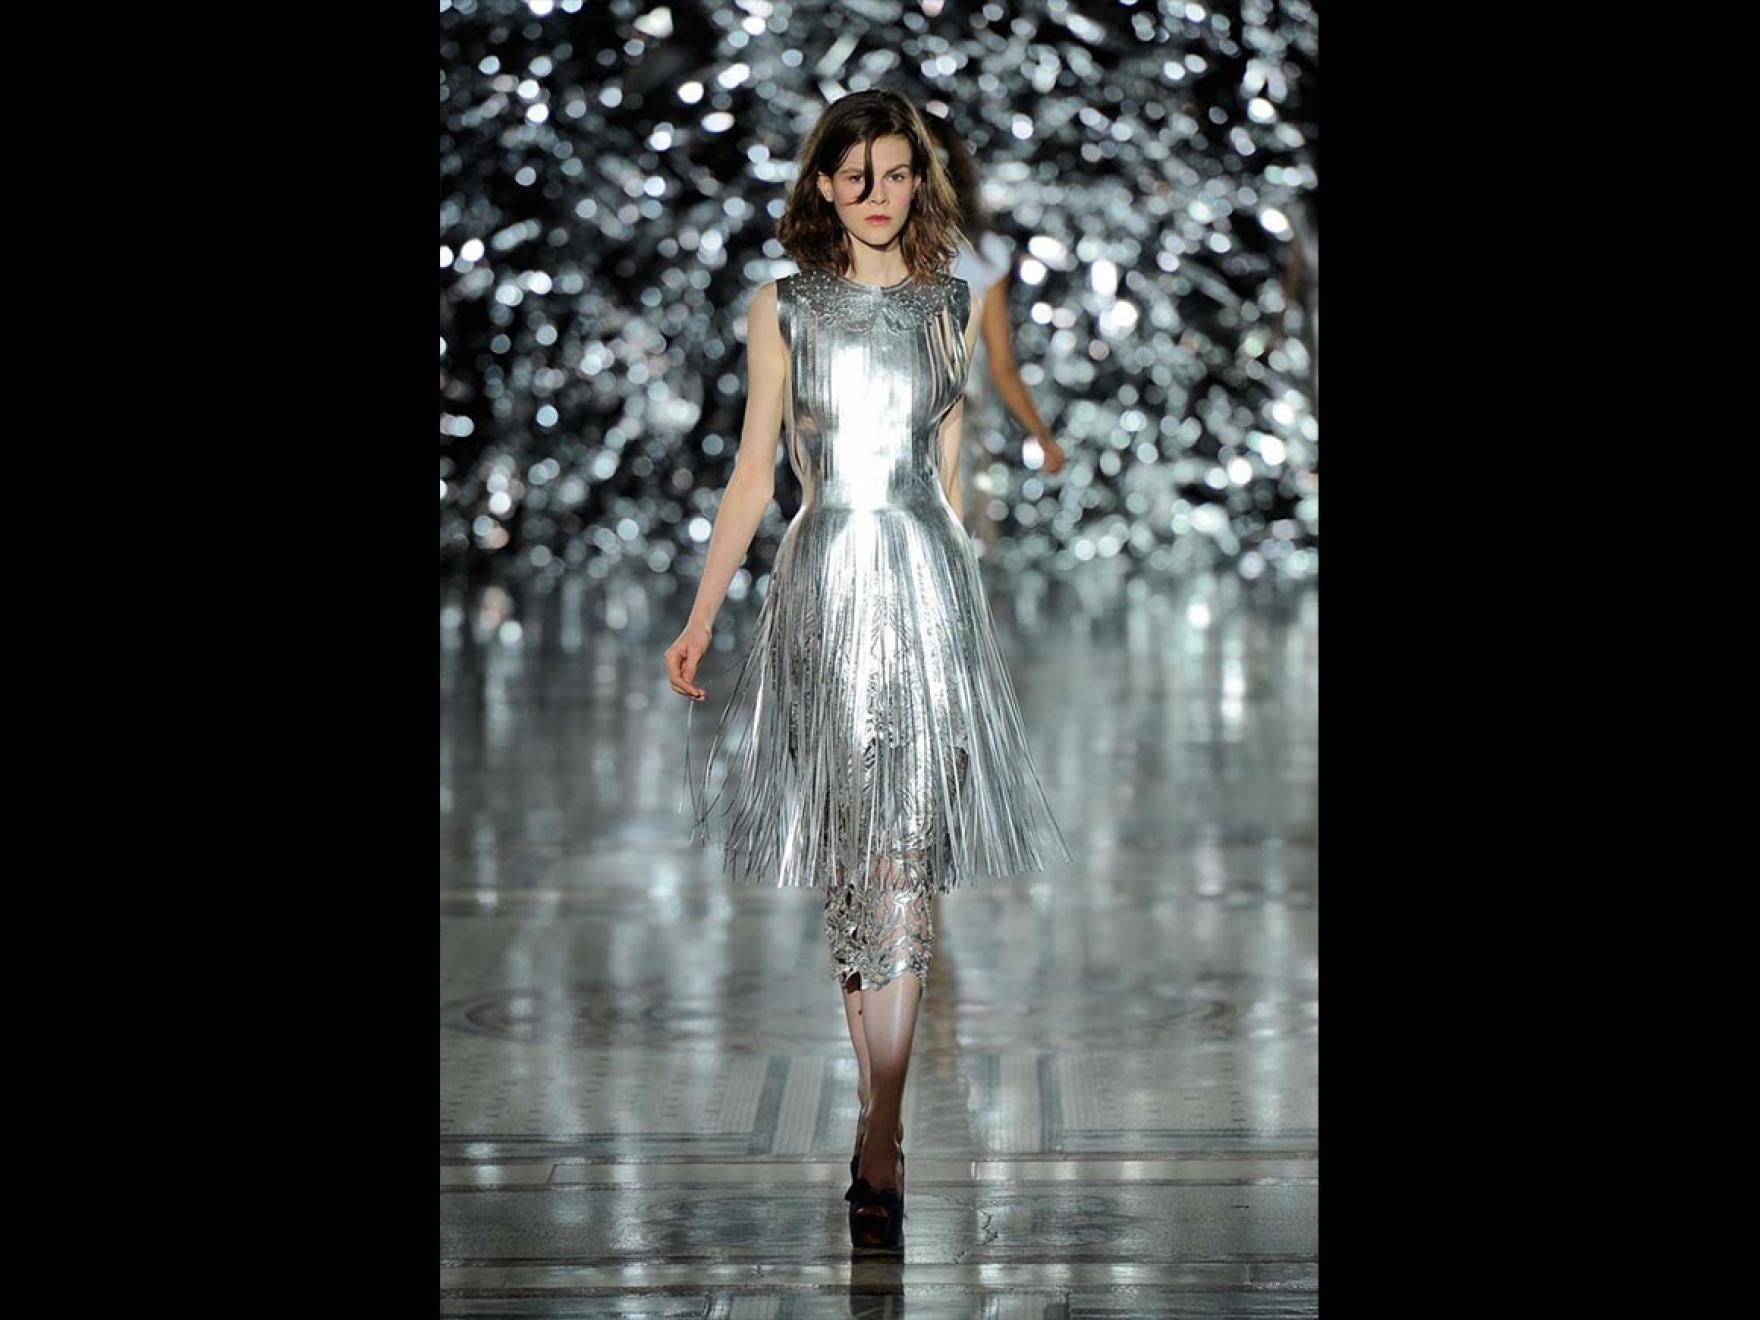 Fashion model wearing dress with silver sheen on runway